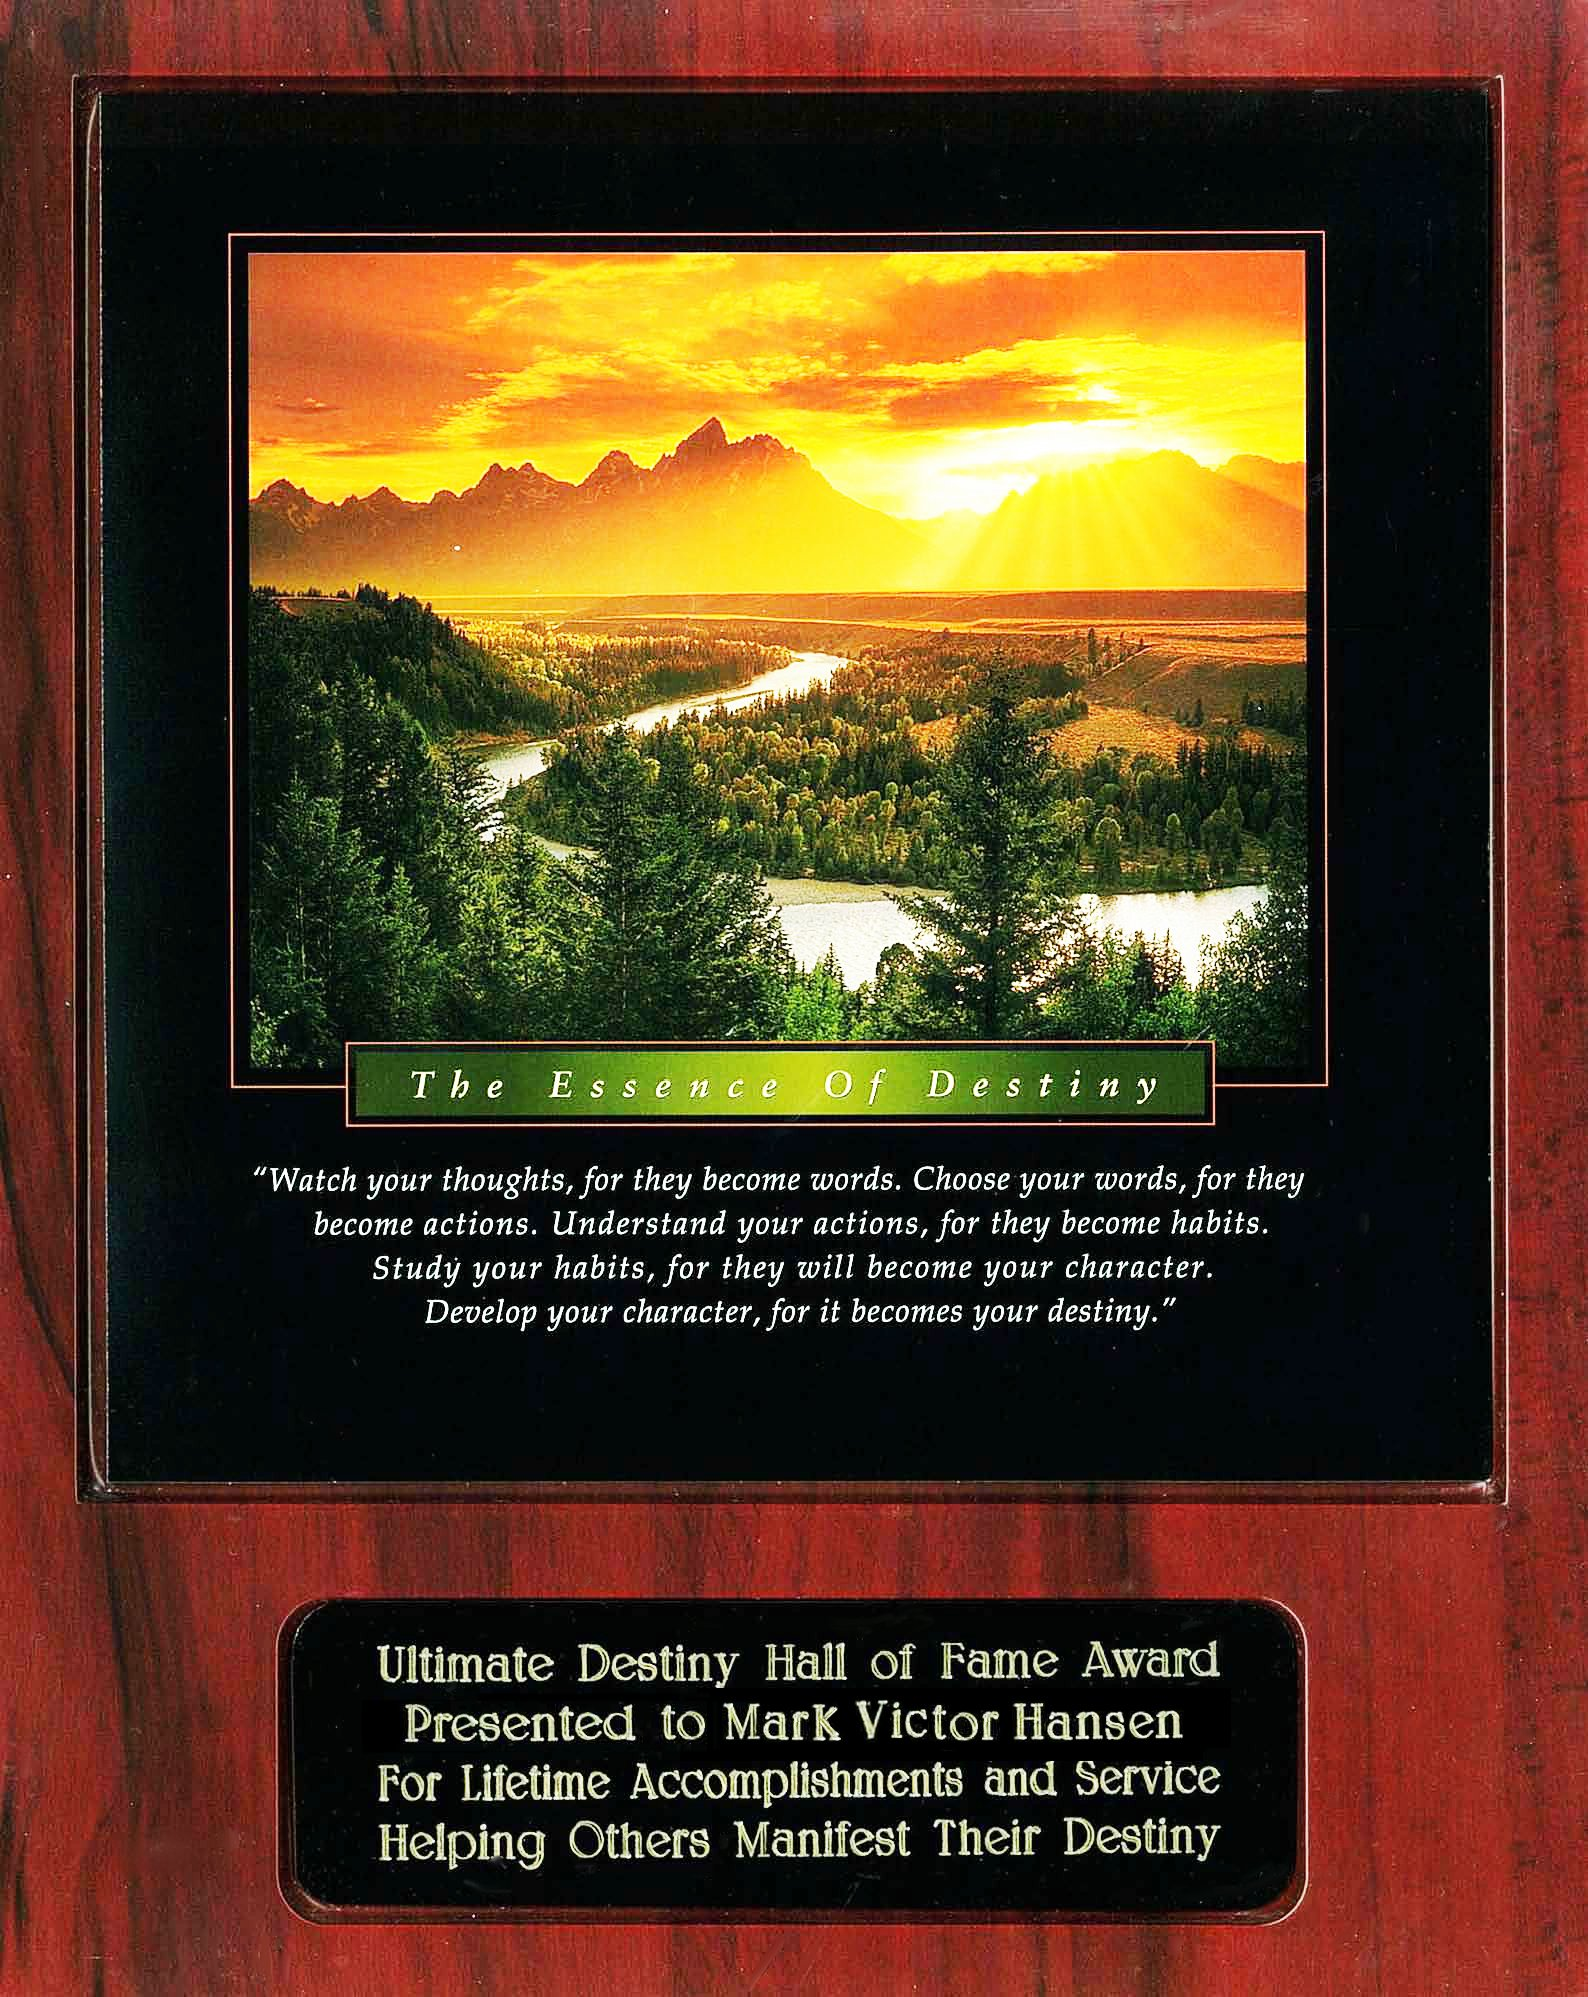 Mark Victor Hansen, Ultimate Destiny Hall of Fame Award Recipient, Award Plaque